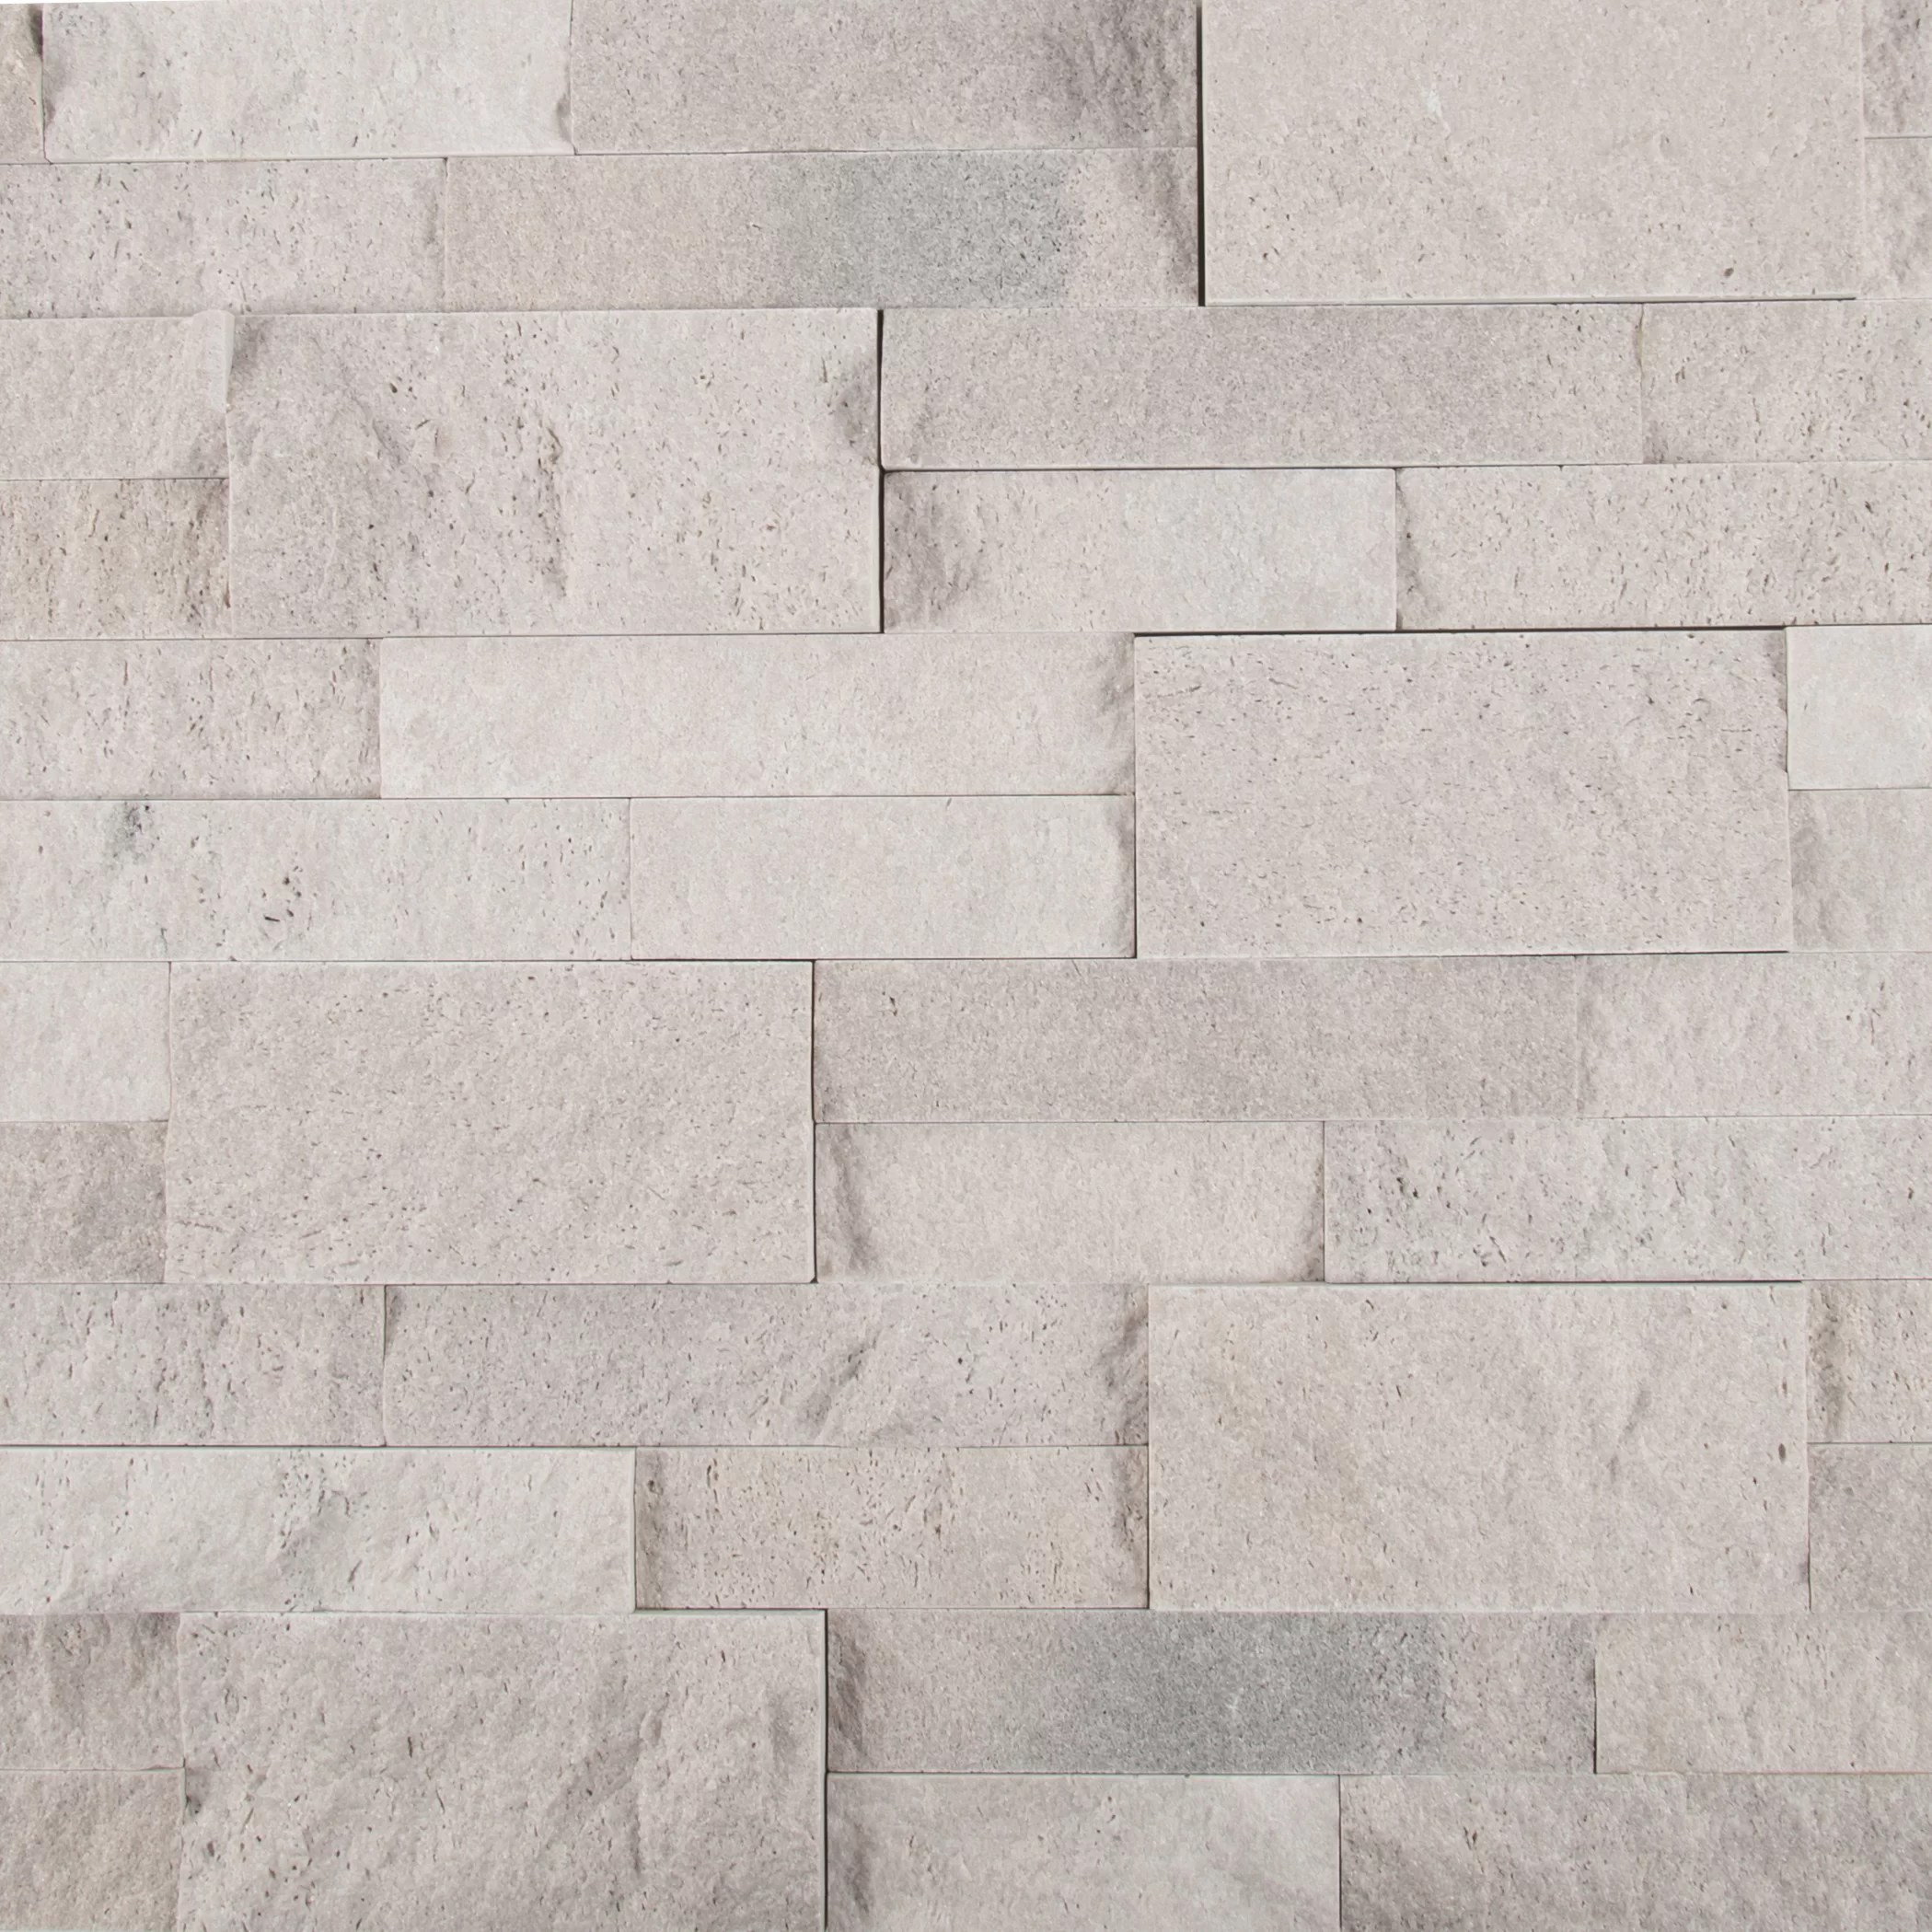 iceland 6 x 24 travertine stacked stone tile